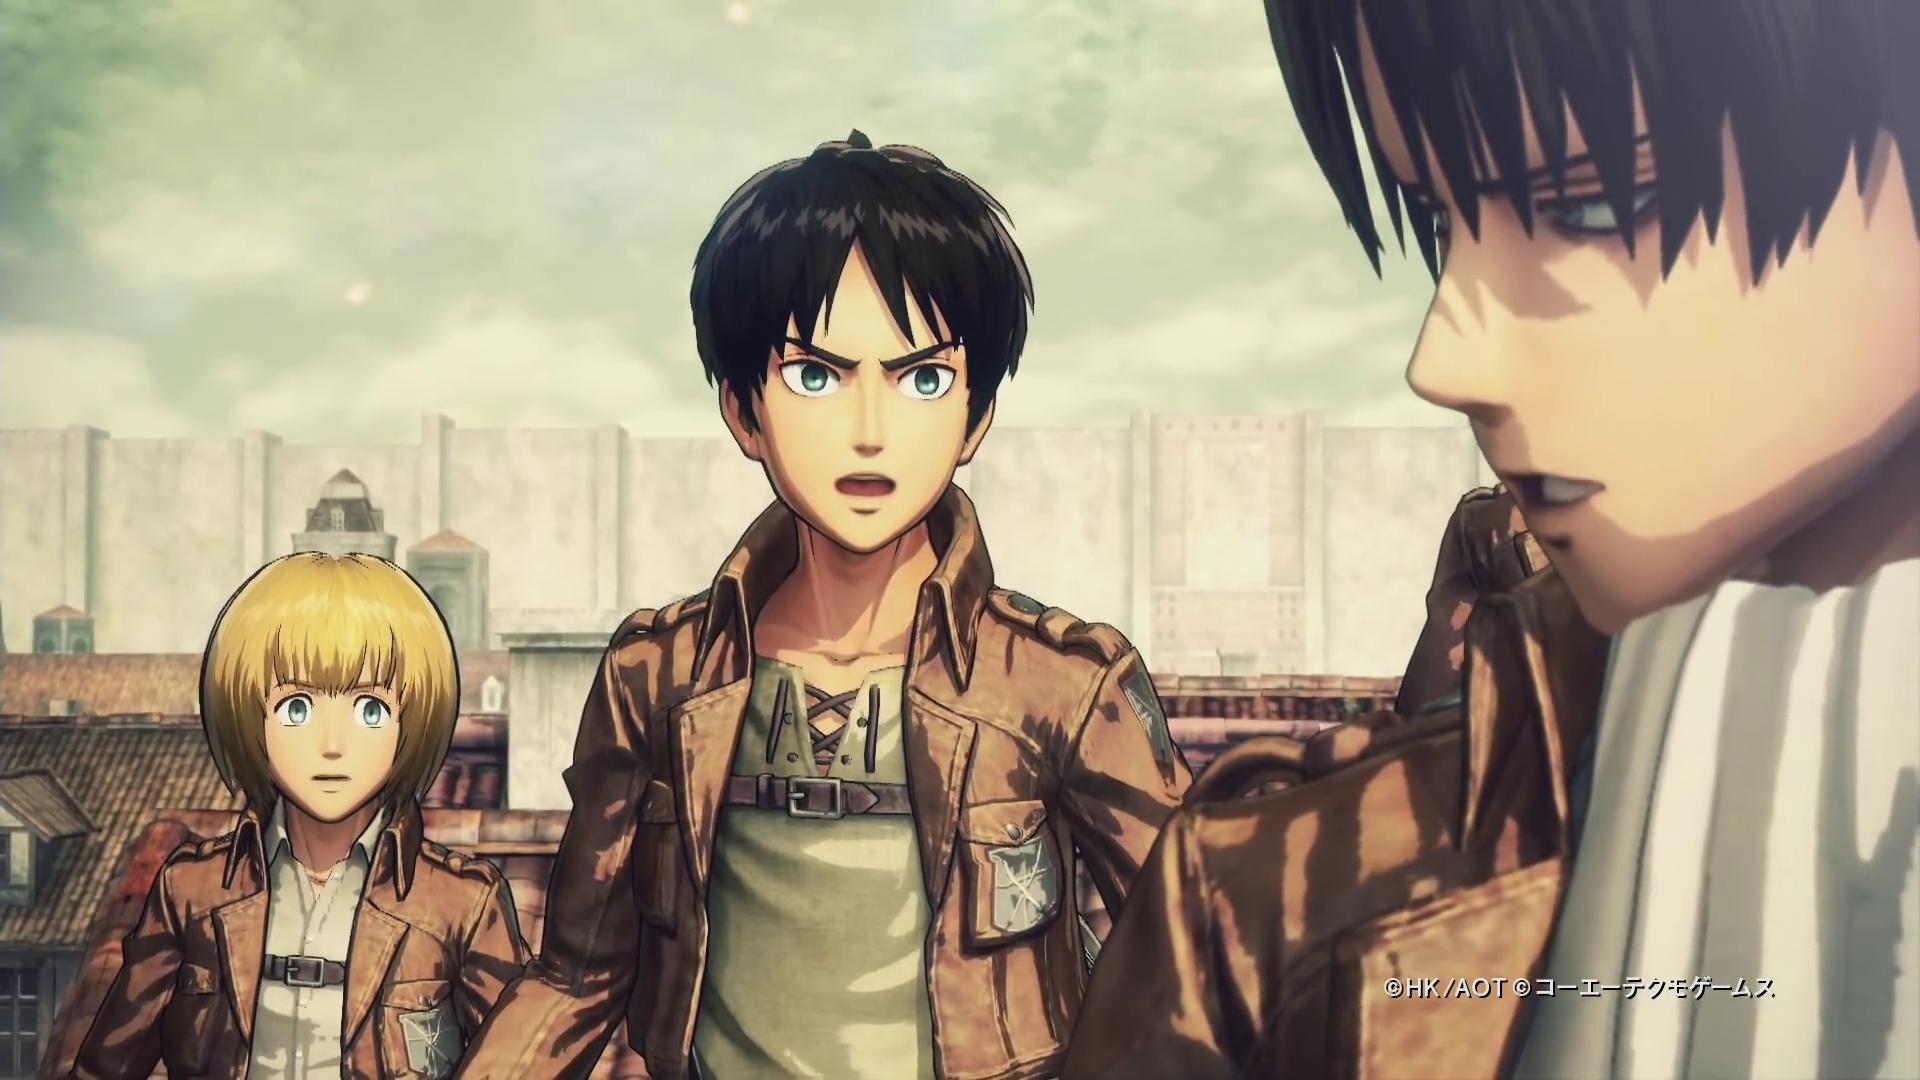 vlcsnap-2015-11-27-16h20m42s673 Koei Tecmo Attack on Titan Gameplay Trailer